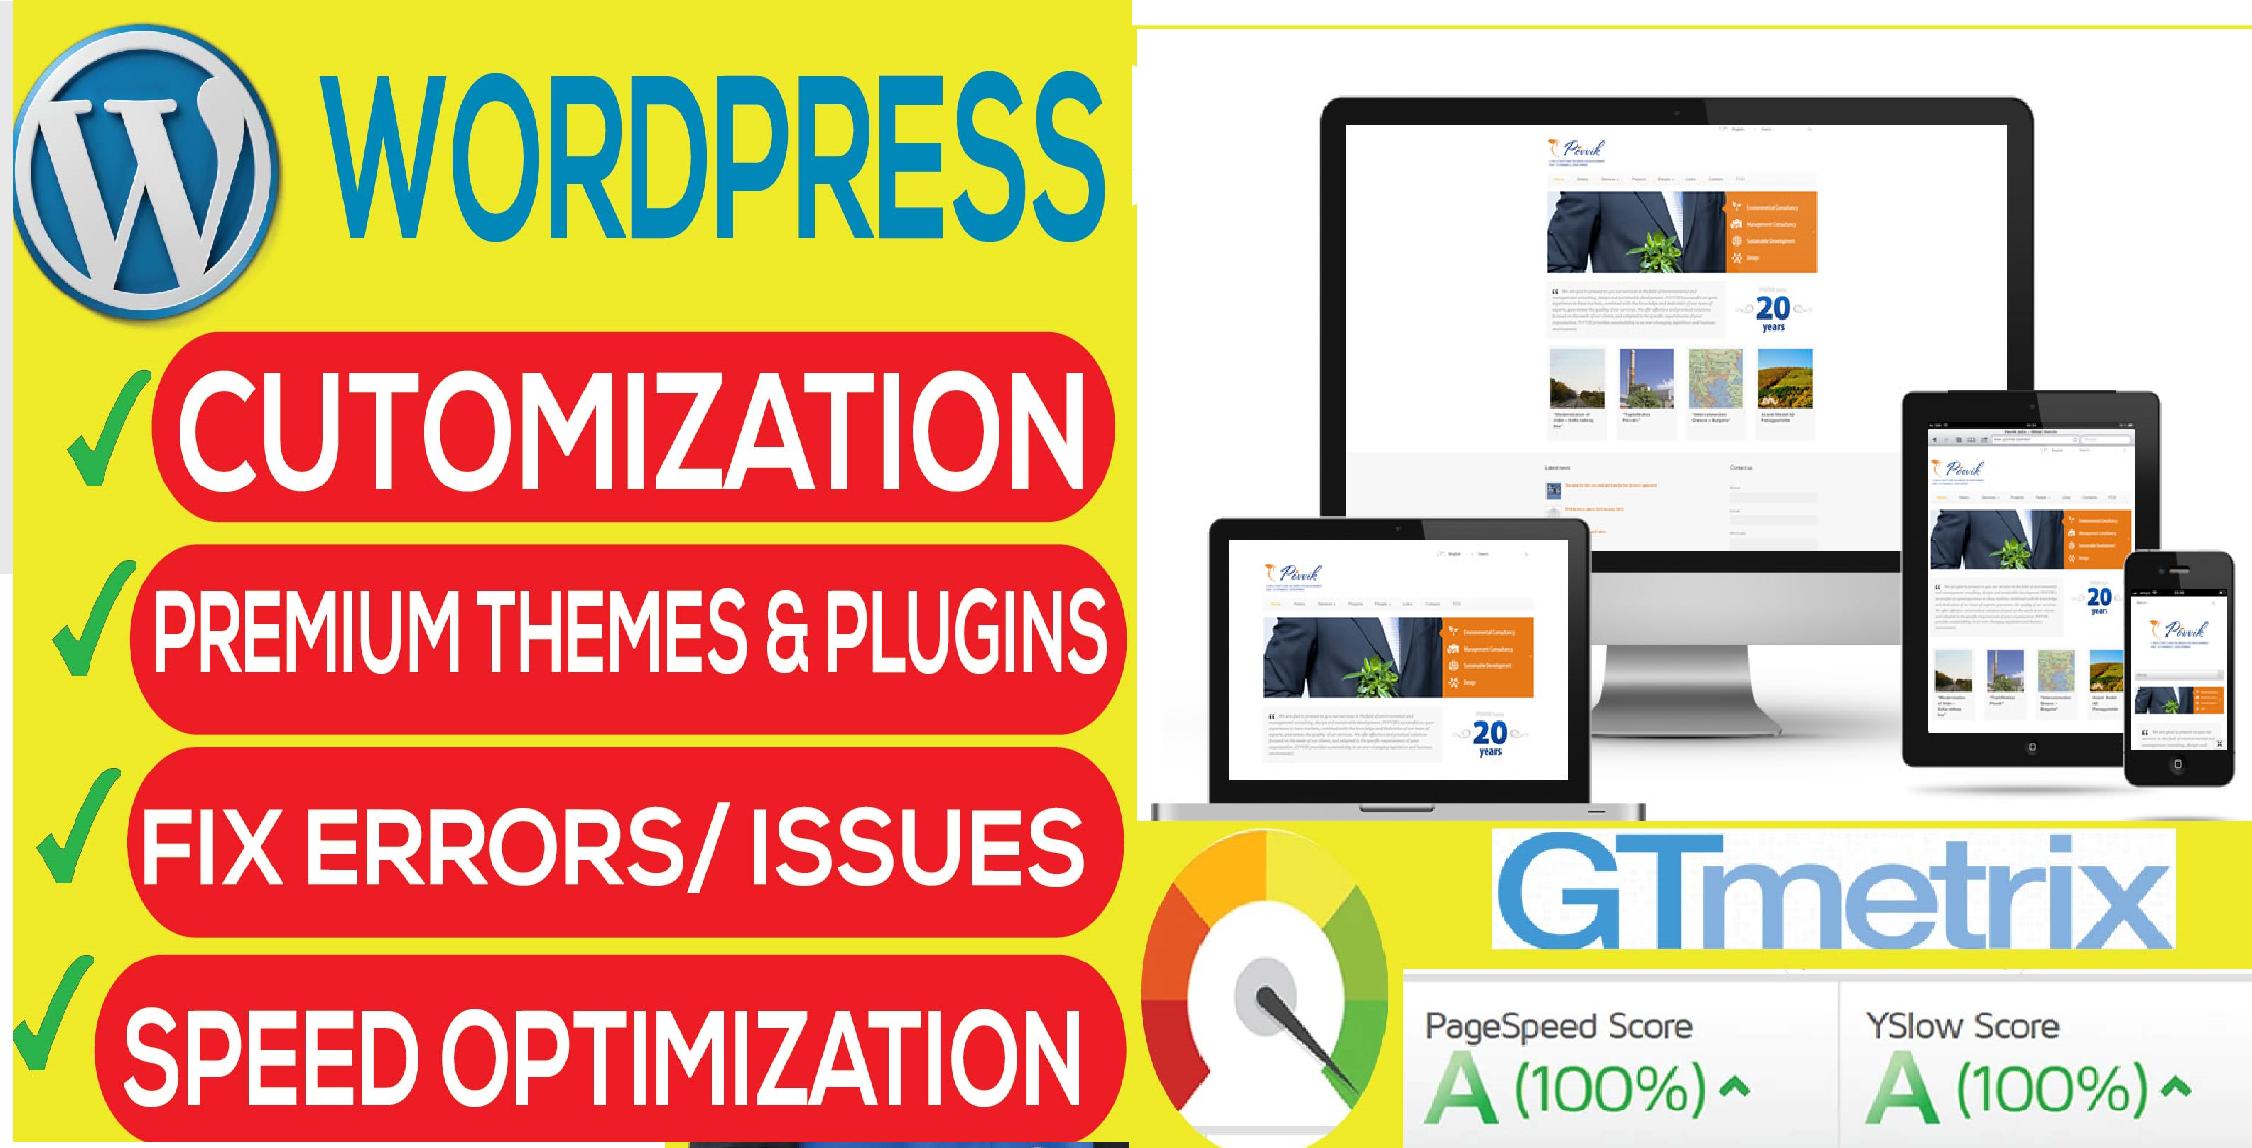 I will build wordpress website responsive and SEO friendly